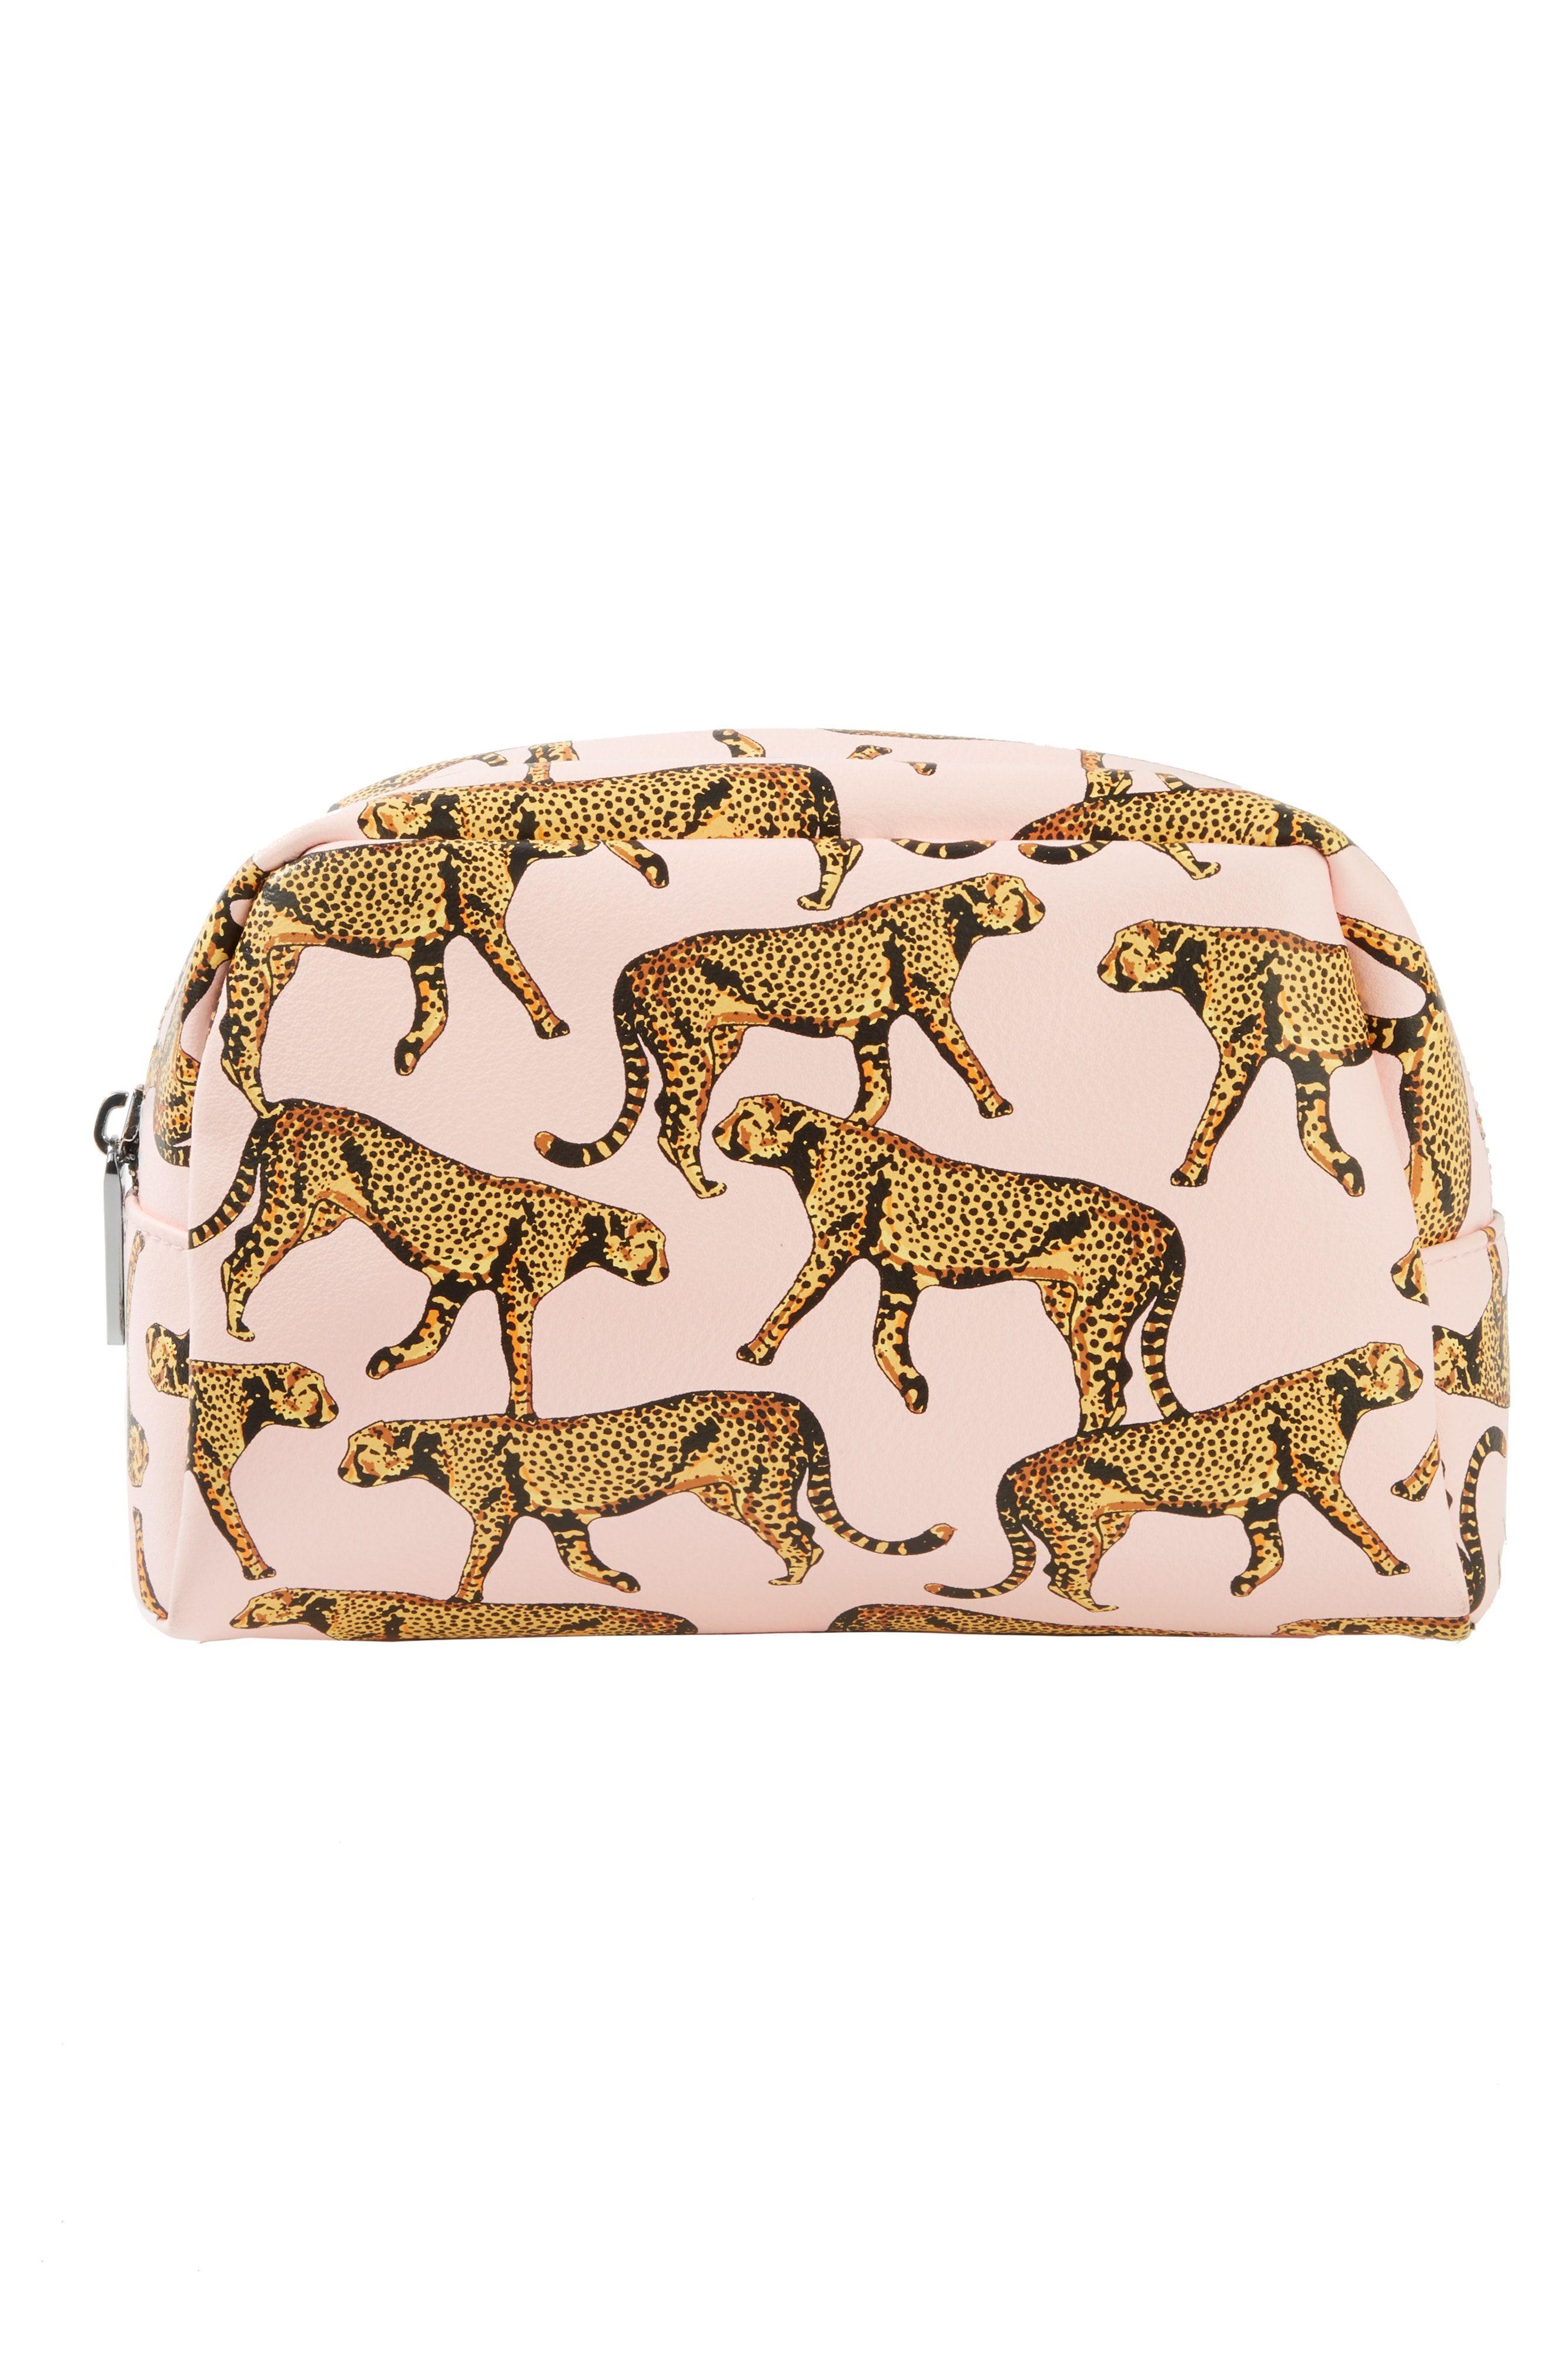 Skinny Dip True Leopard Makeup Bag giftideas Leopard